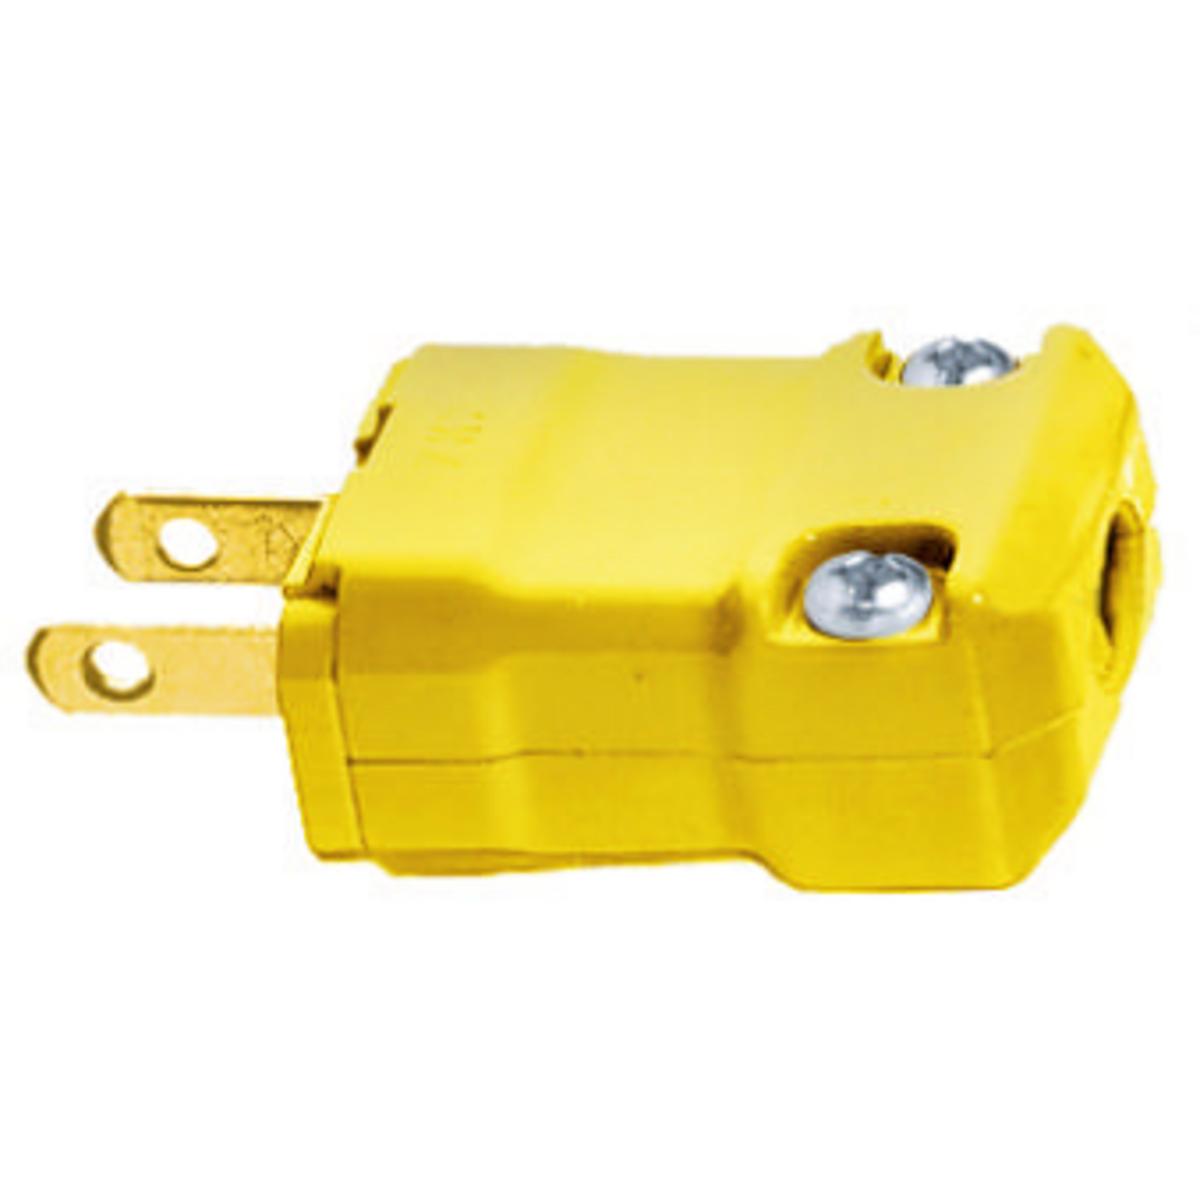 Hubbell HBL5866VY 15 Amp 125 Volt 2-Pole 2-Wire NEMA 1-15P Yellow Nylon Straight Blade Plug